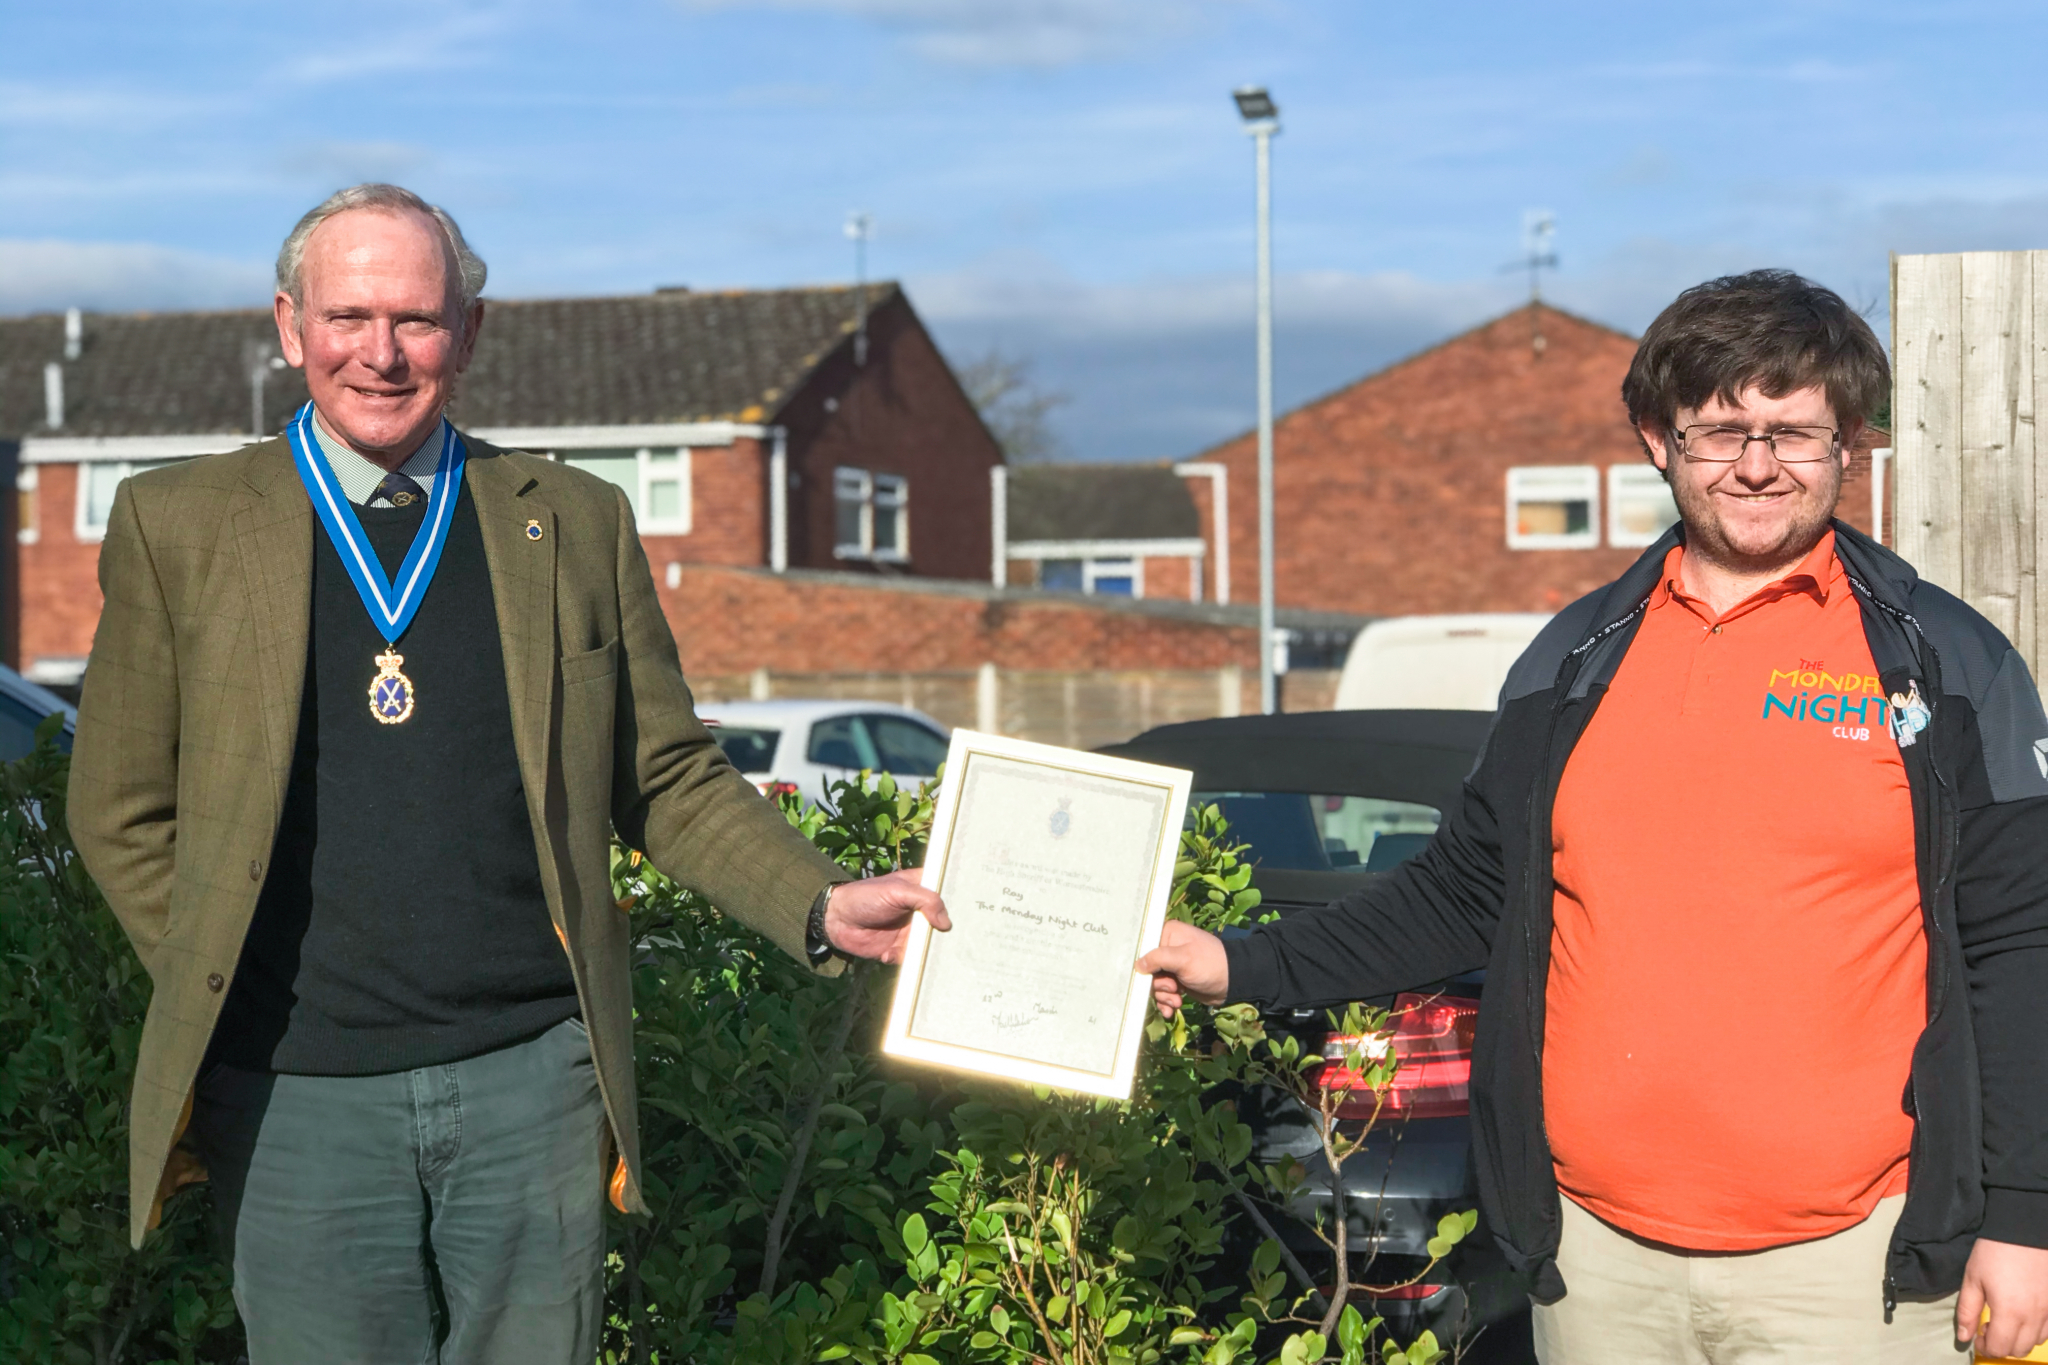 ray award worcestershire